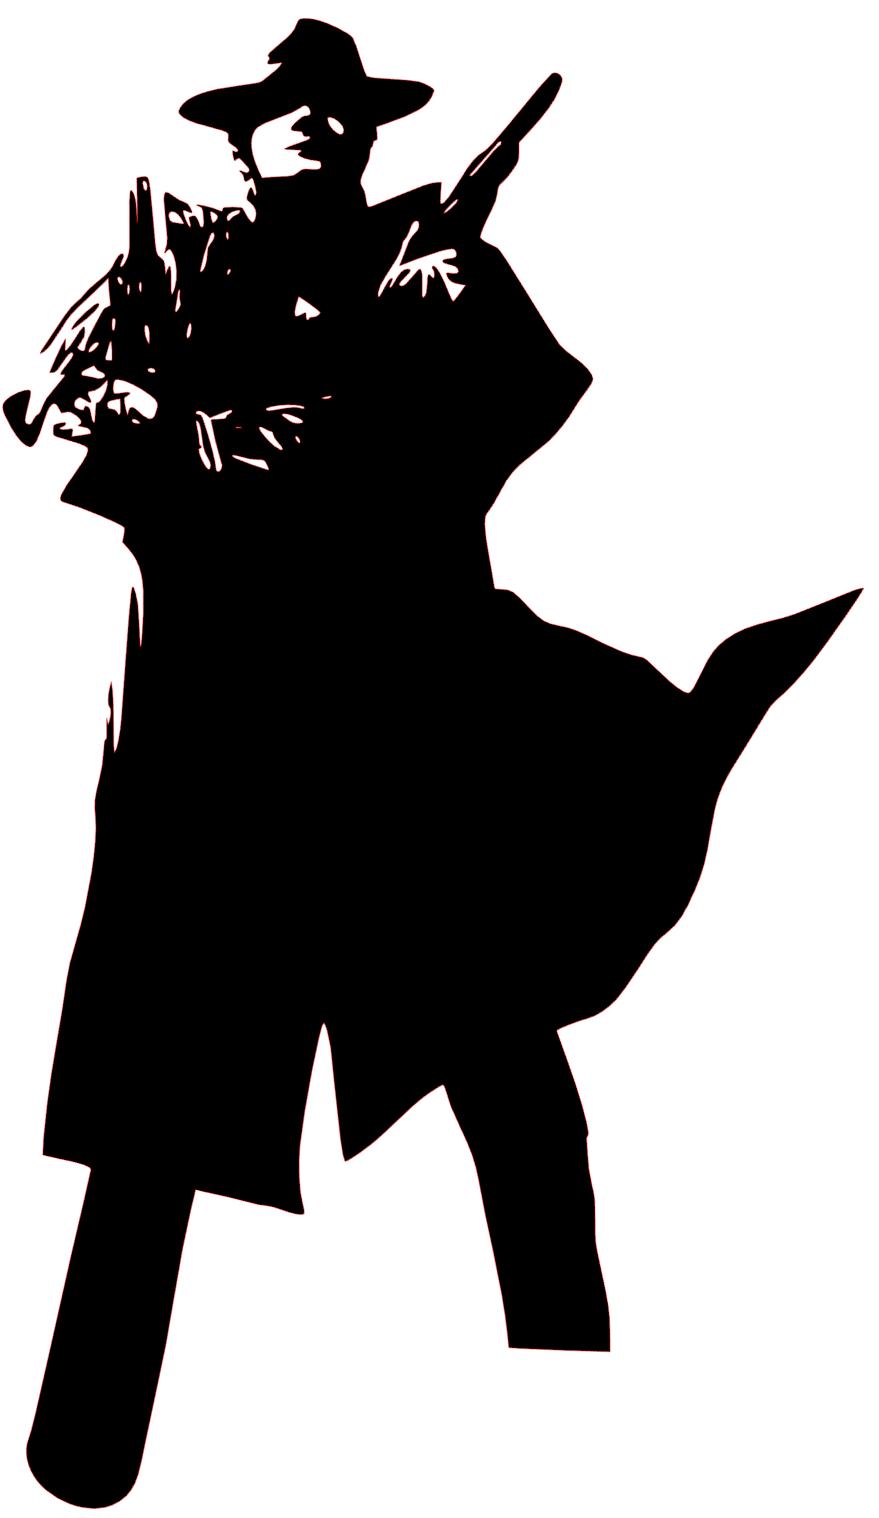 Dark Tower clipart #8, Download drawings